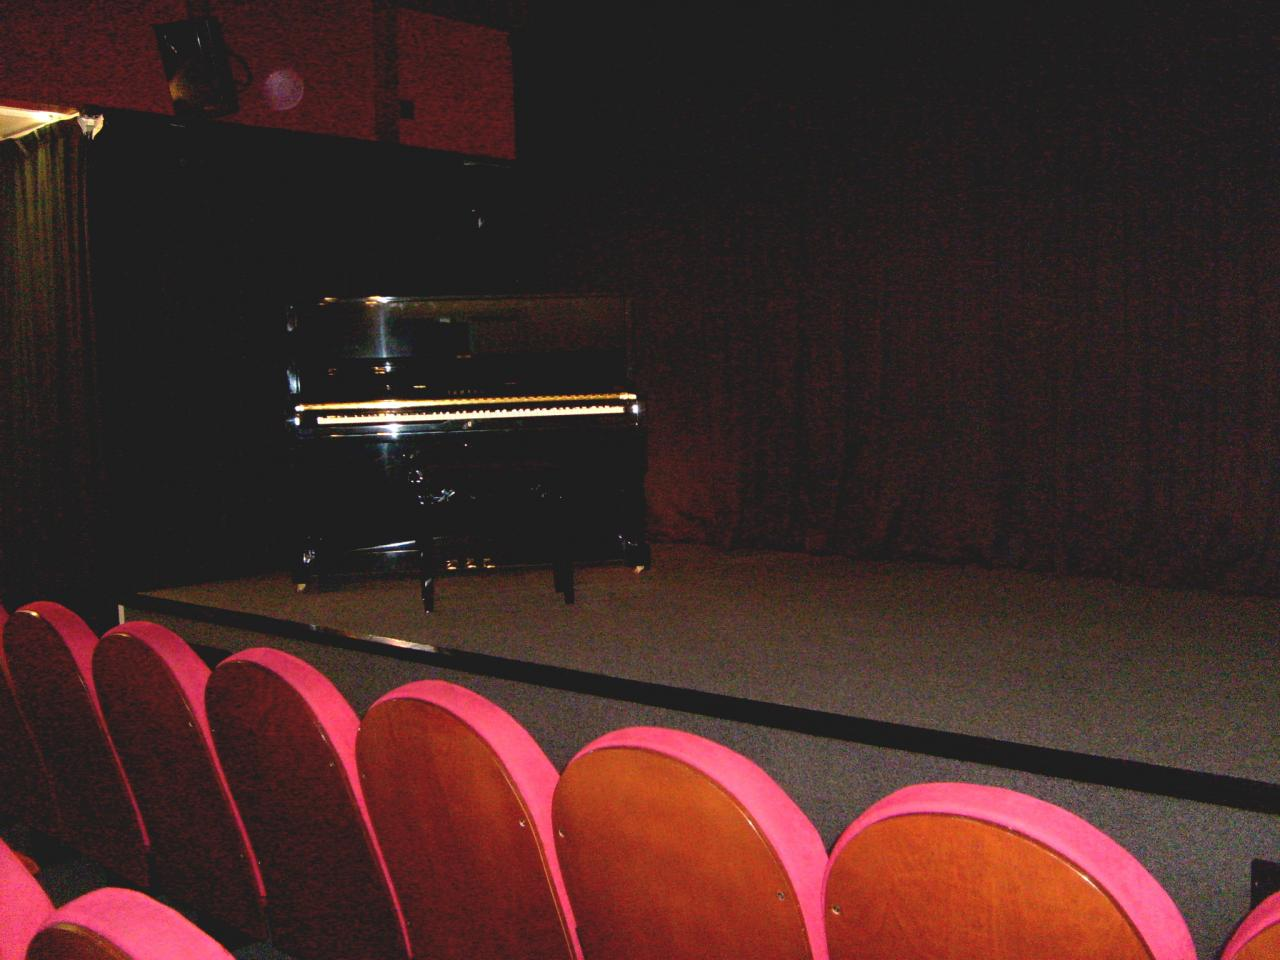 belvedere-spectacle-1.jpg